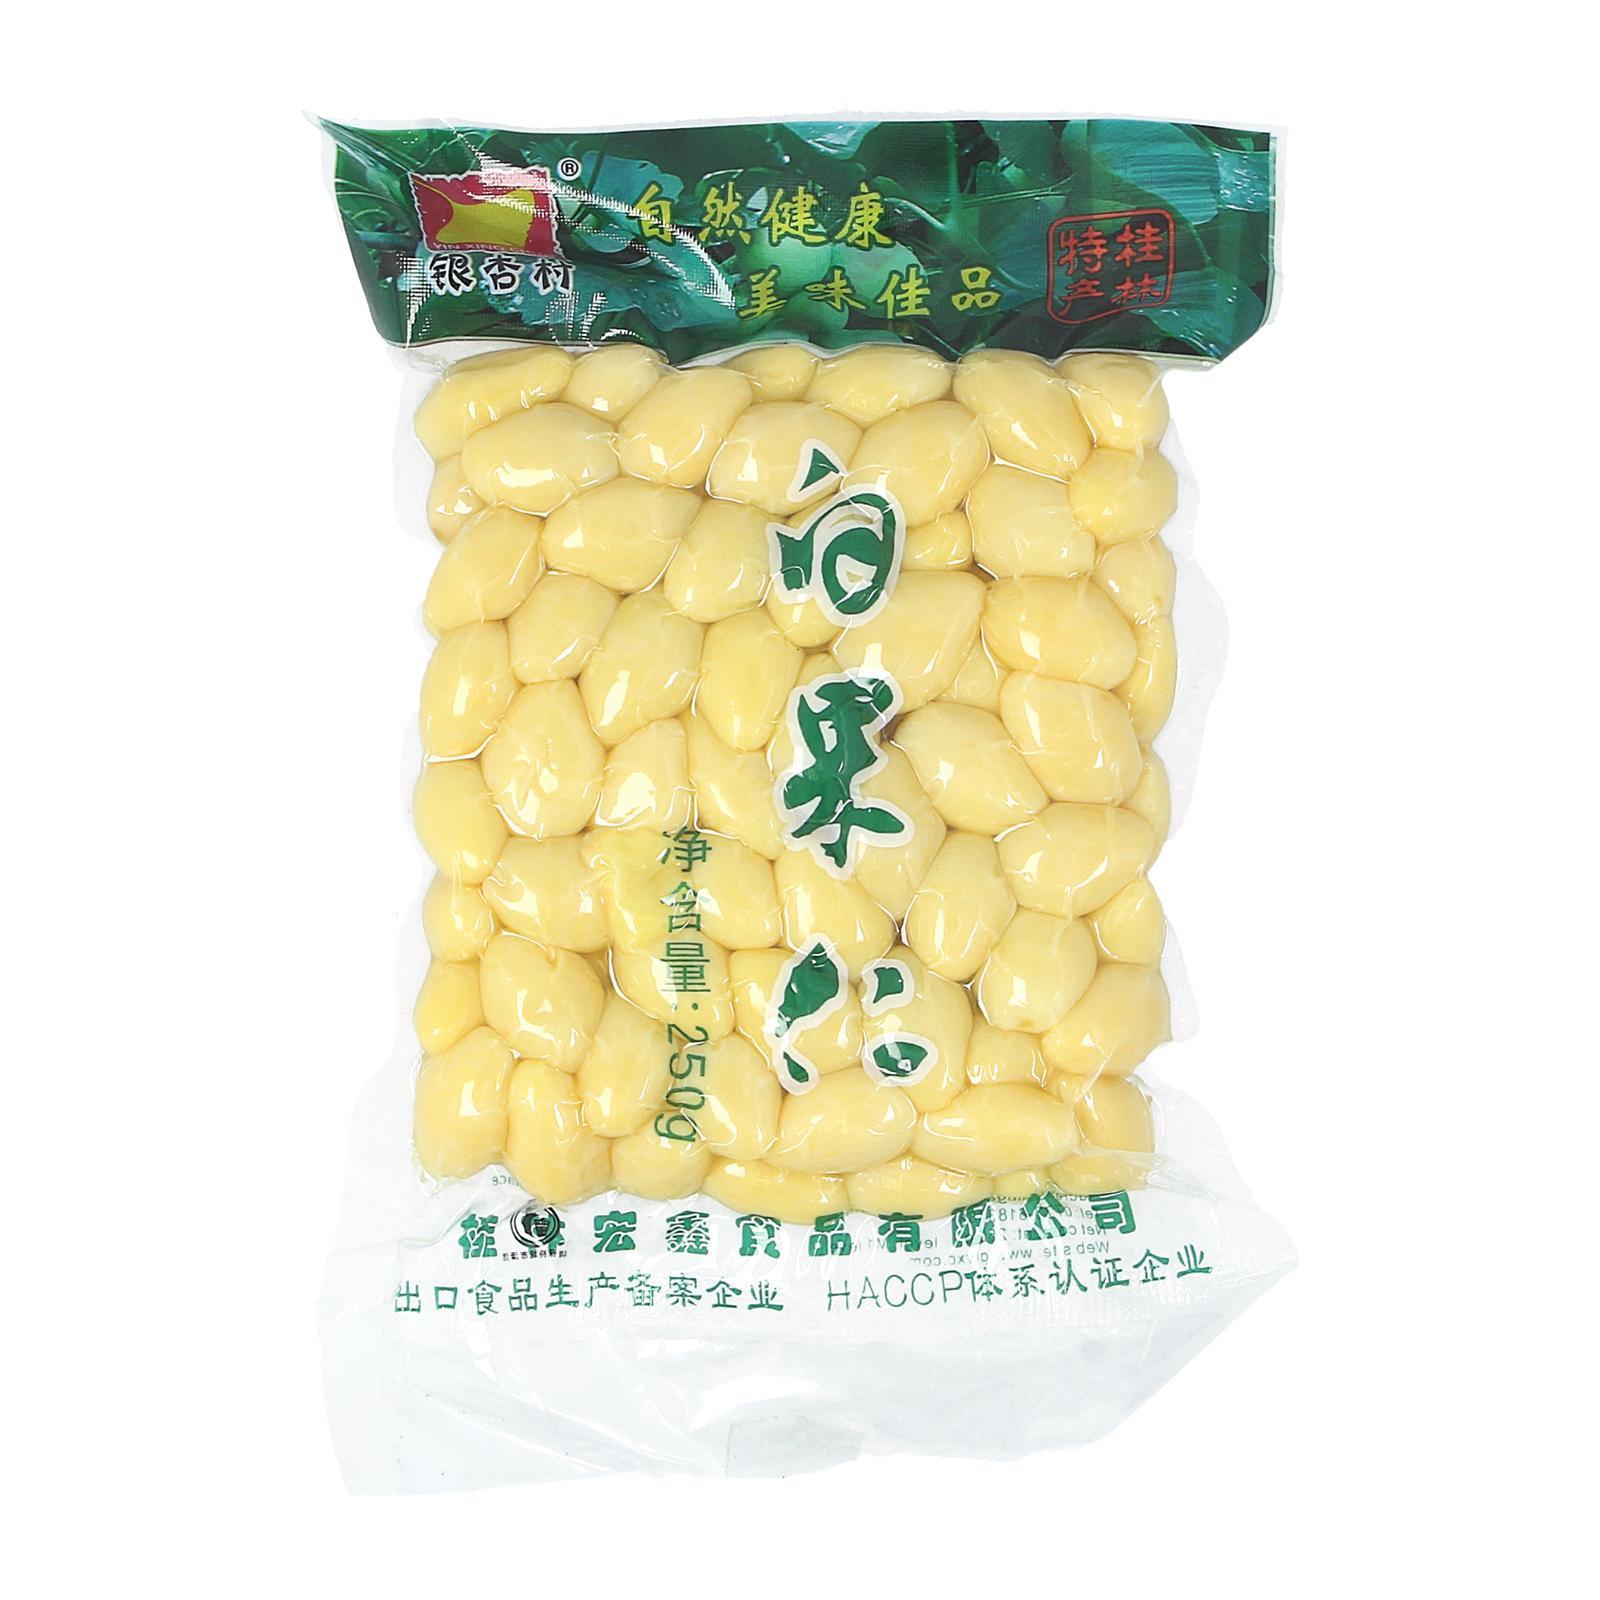 Golden Boy Gingko Nut By Redmart.